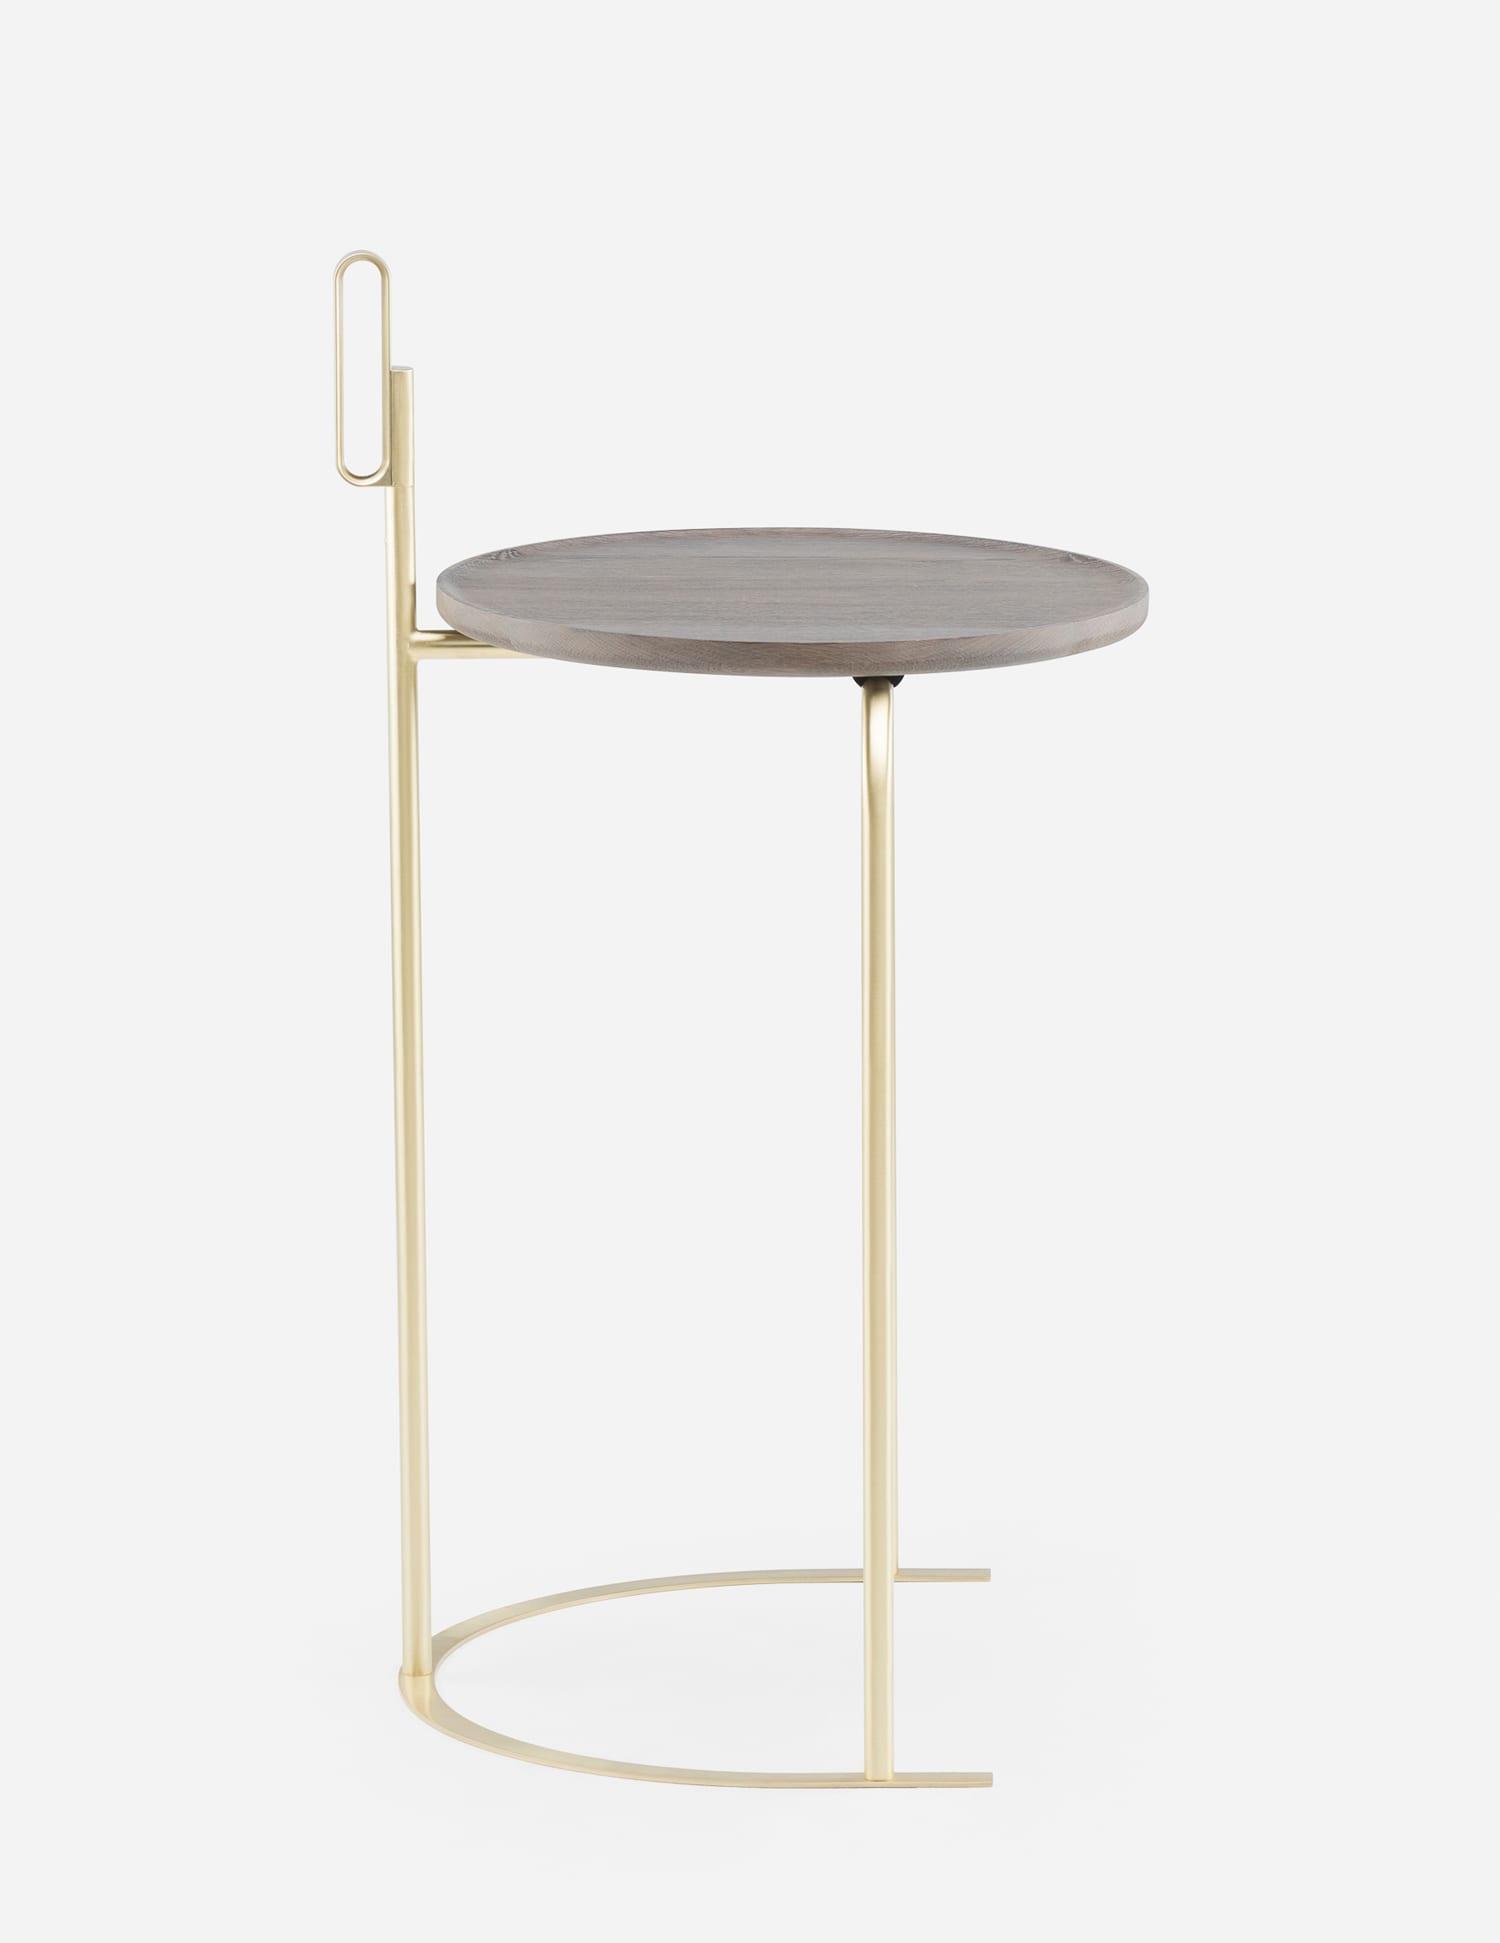 De La Espade Handle Side Table by Neri&Hu at Stockholm Furniture Fair 2018 | Yellowtrace